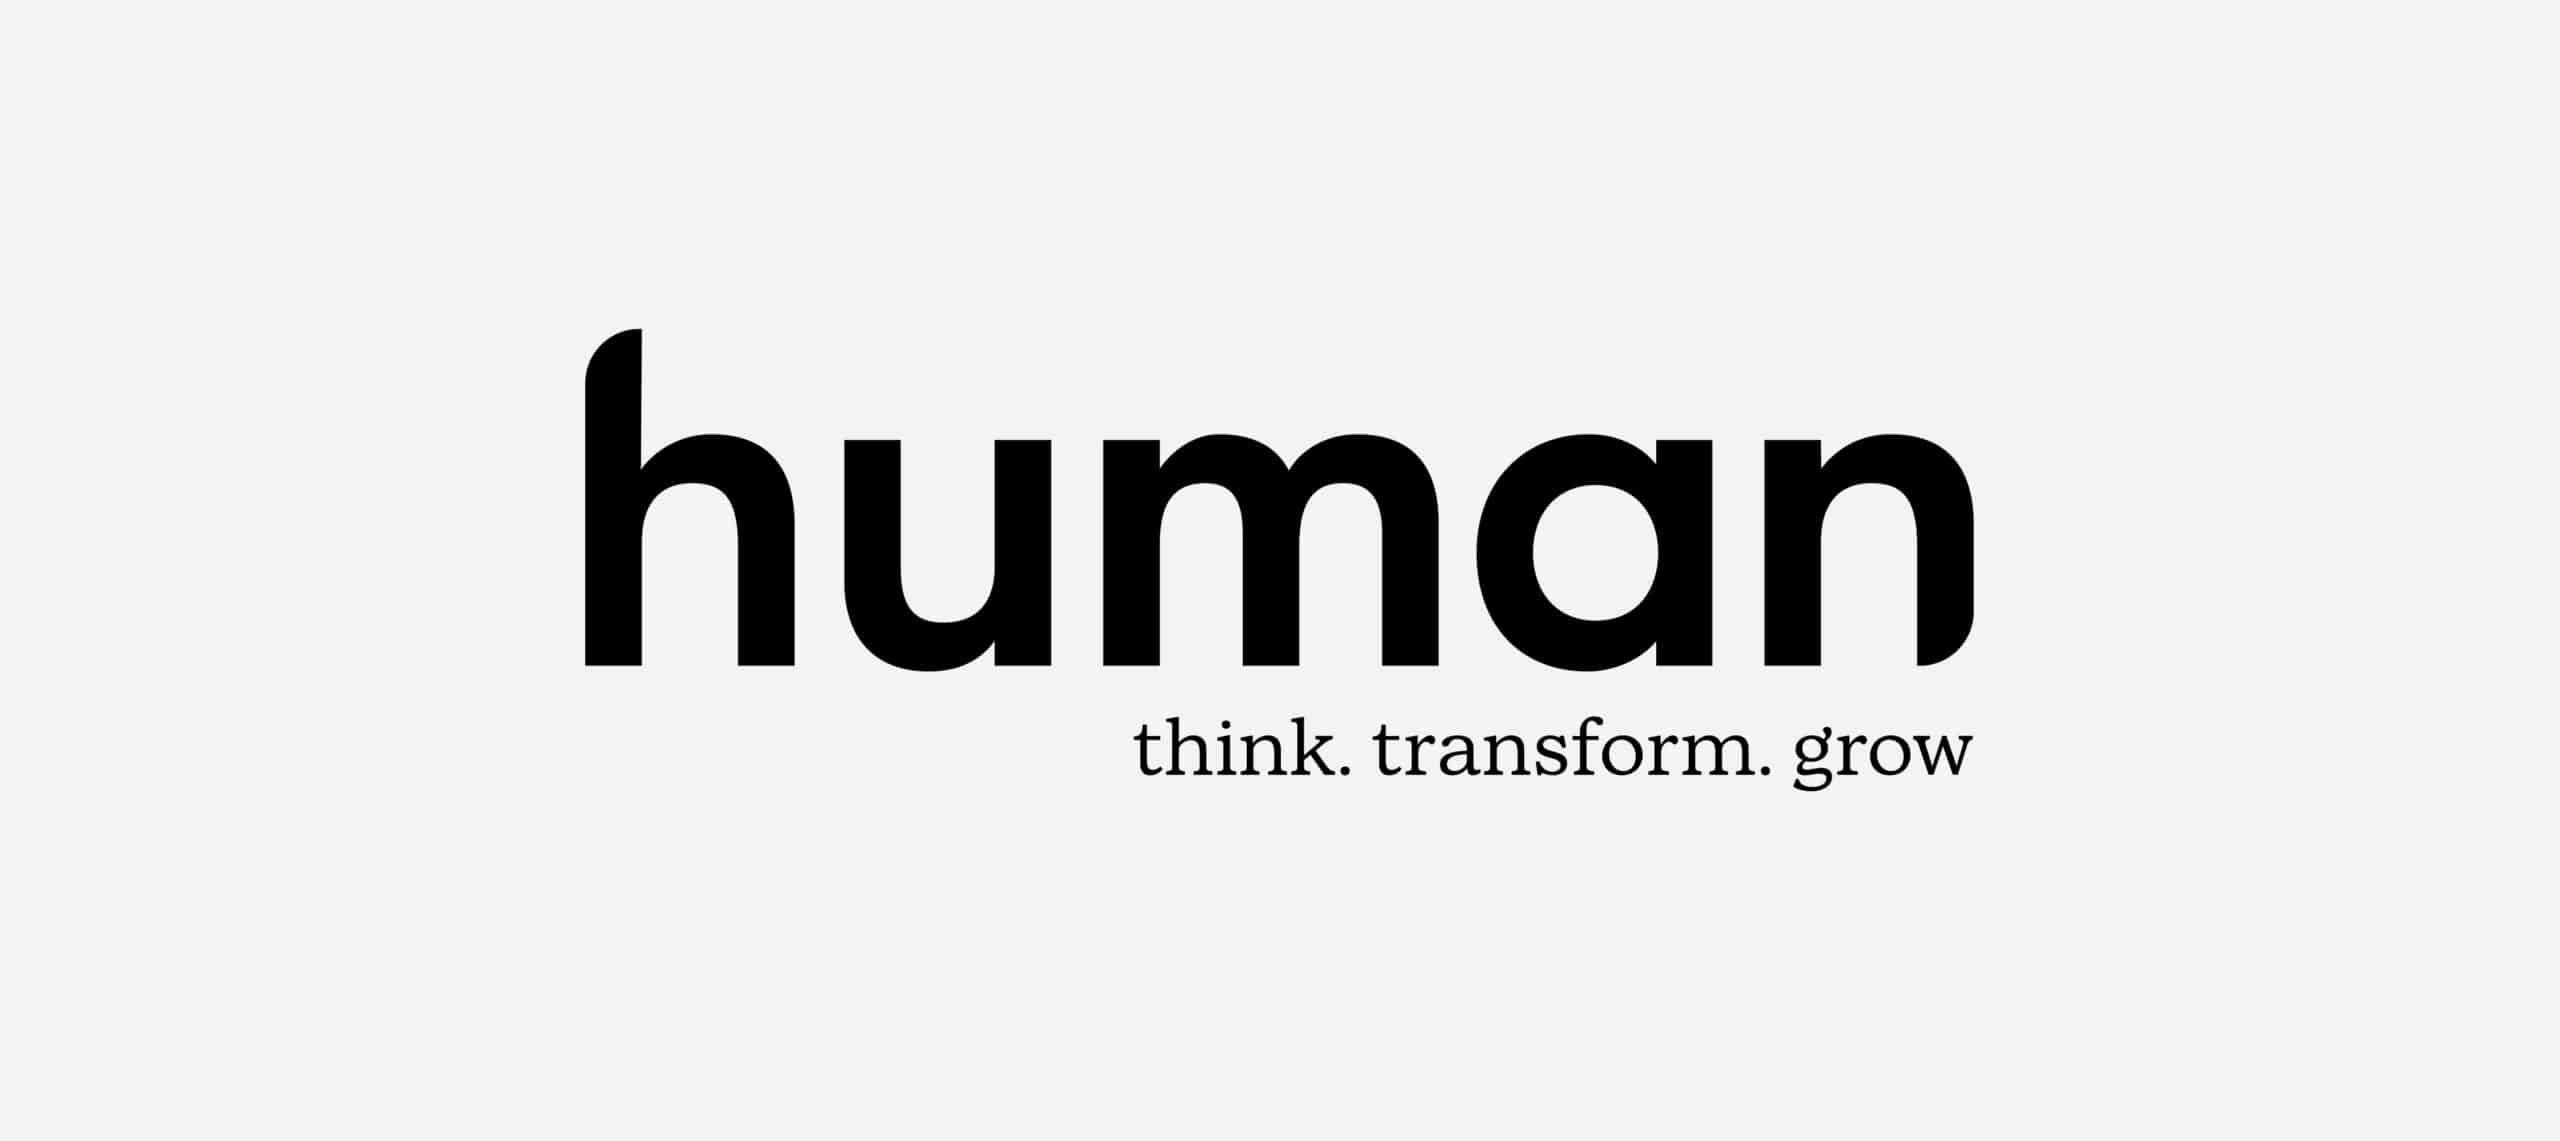 Human_Branding_By_Stellen_Design_Logo_Design-02